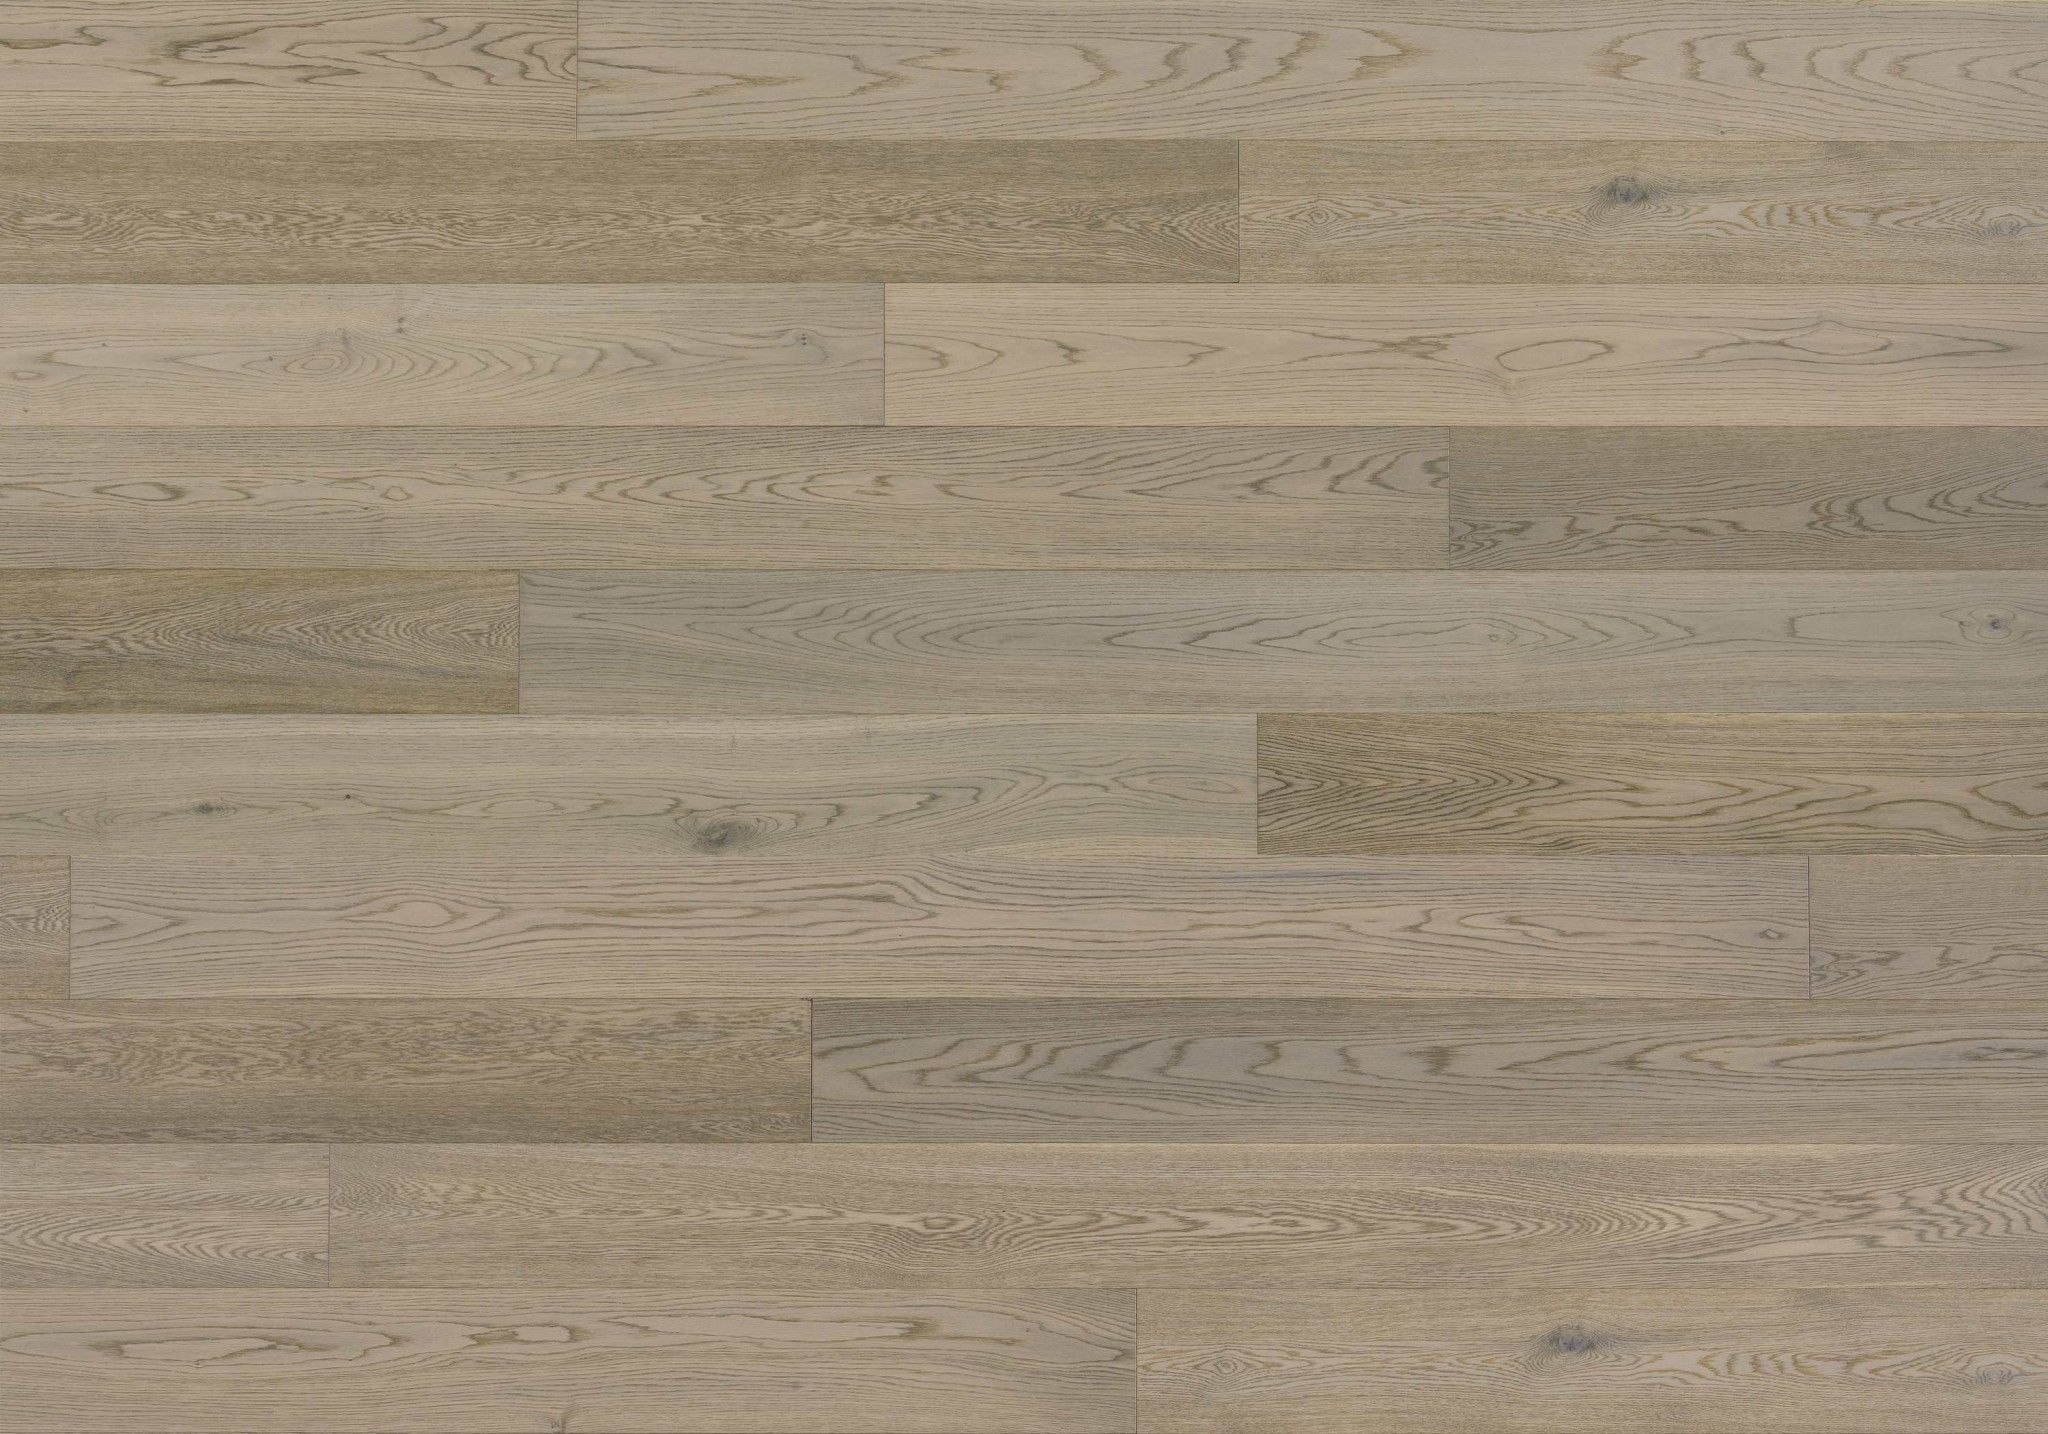 light hardwood floors texture. fifth avenue, designer, white oak, character - lauzon hardwood flooring light floors texture